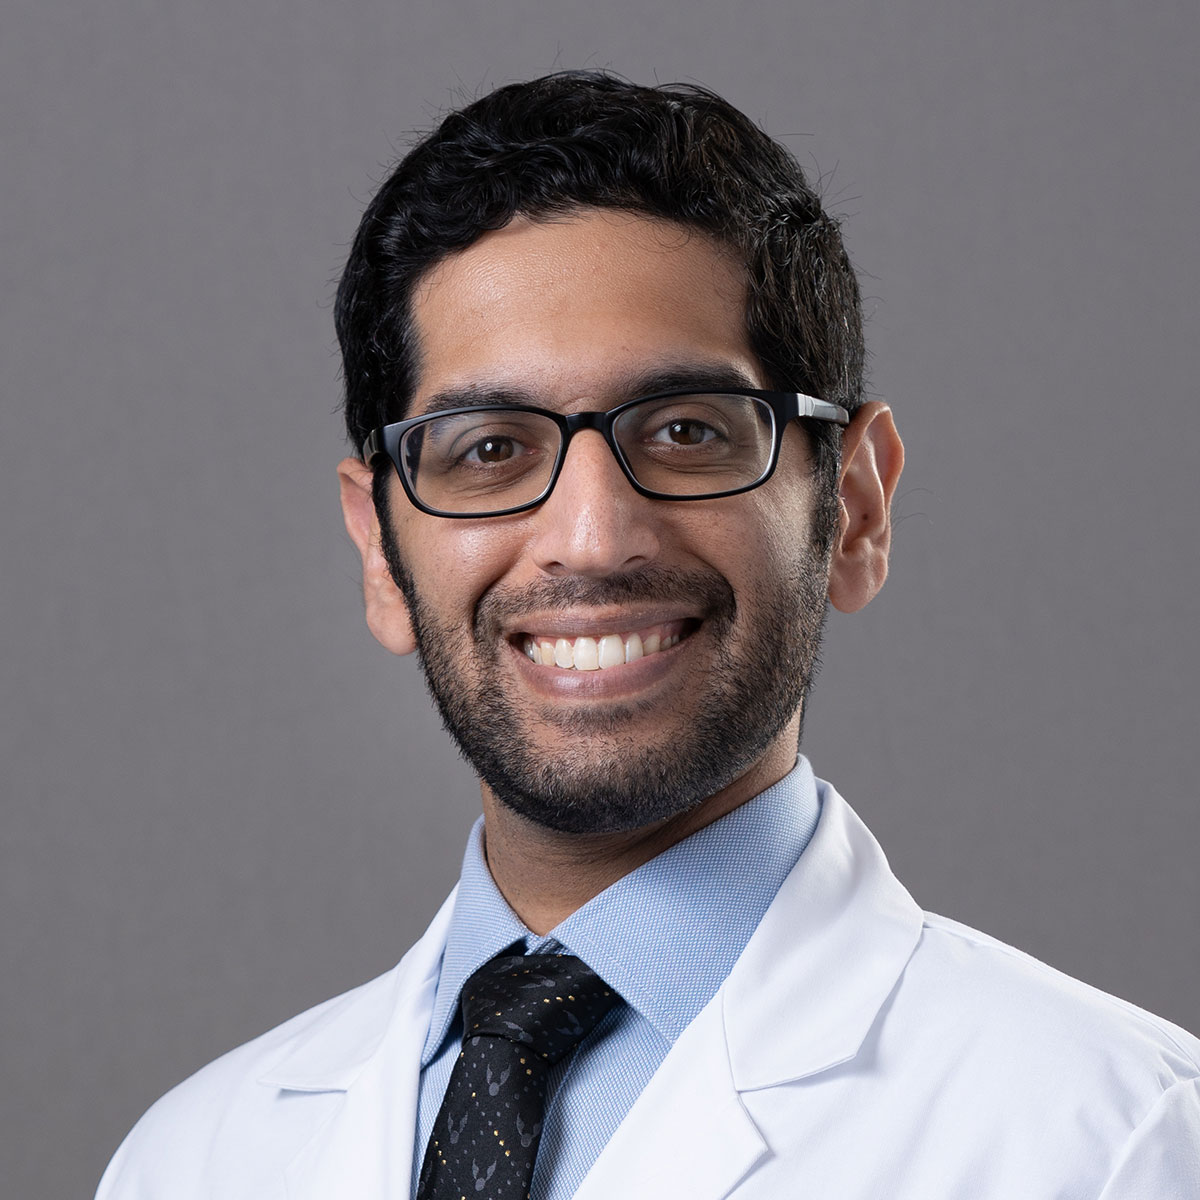 A friendly headshot of Dr. Saumya Gurbni